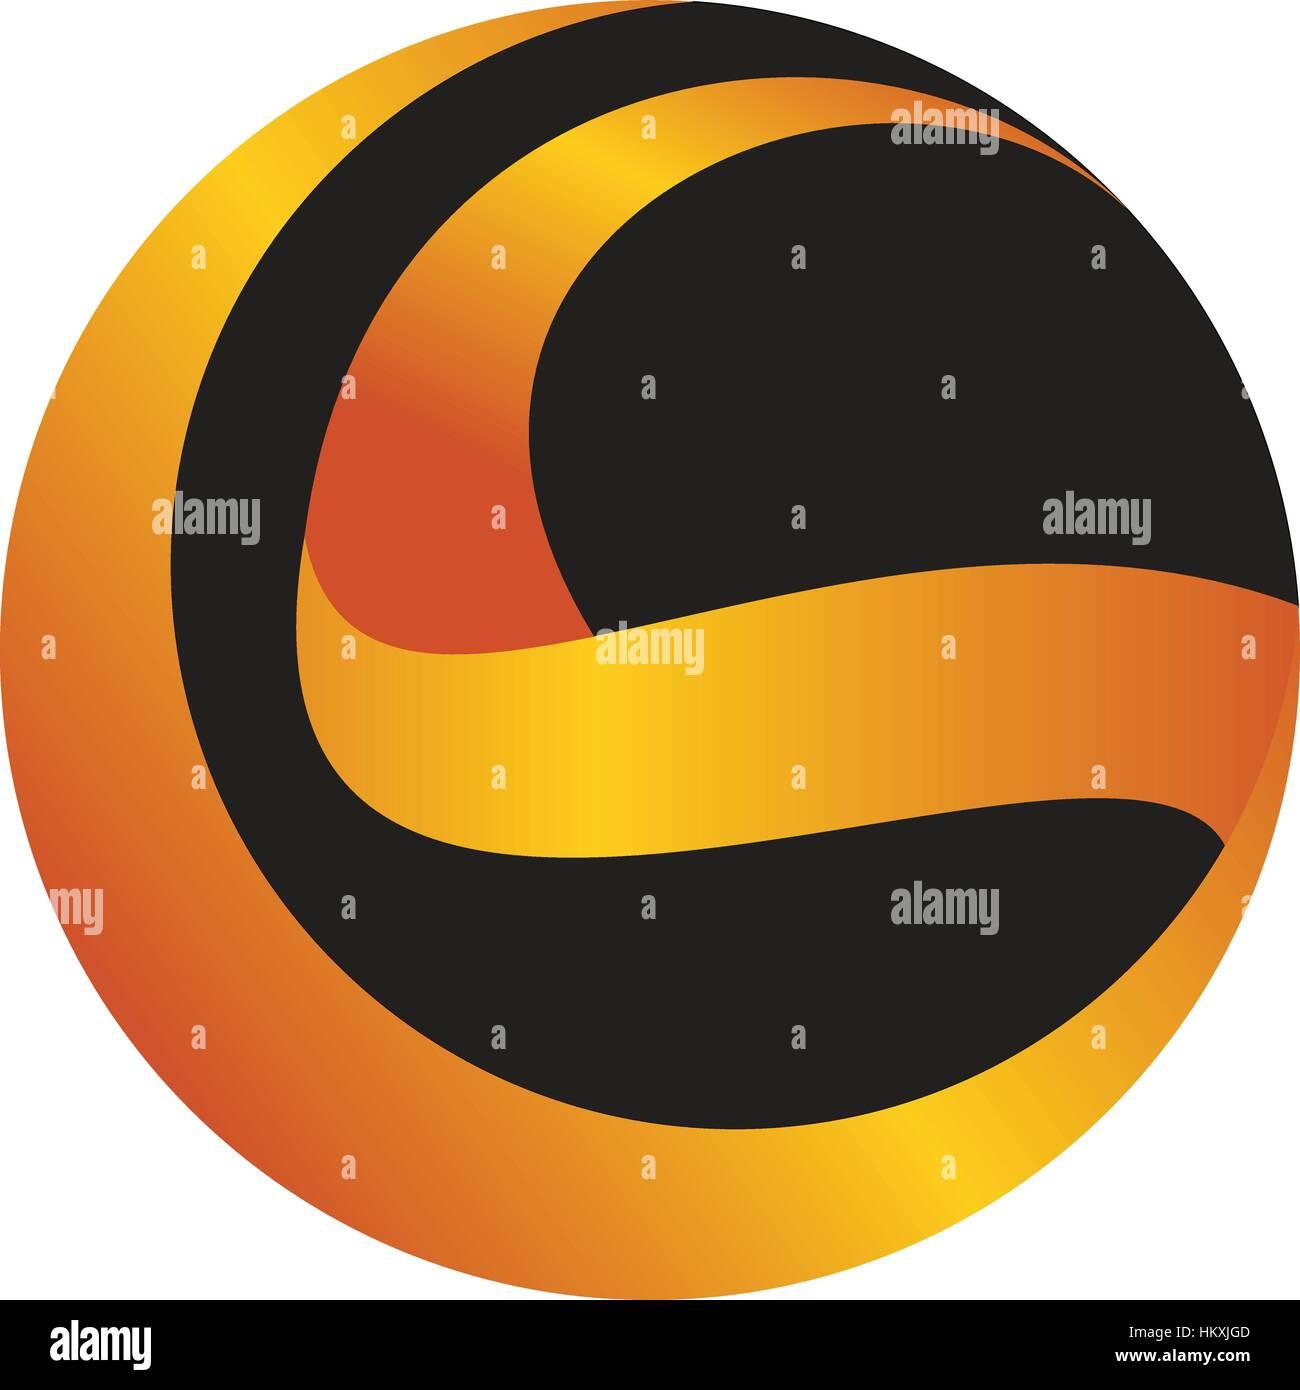 Logo Initial S - Stock Image